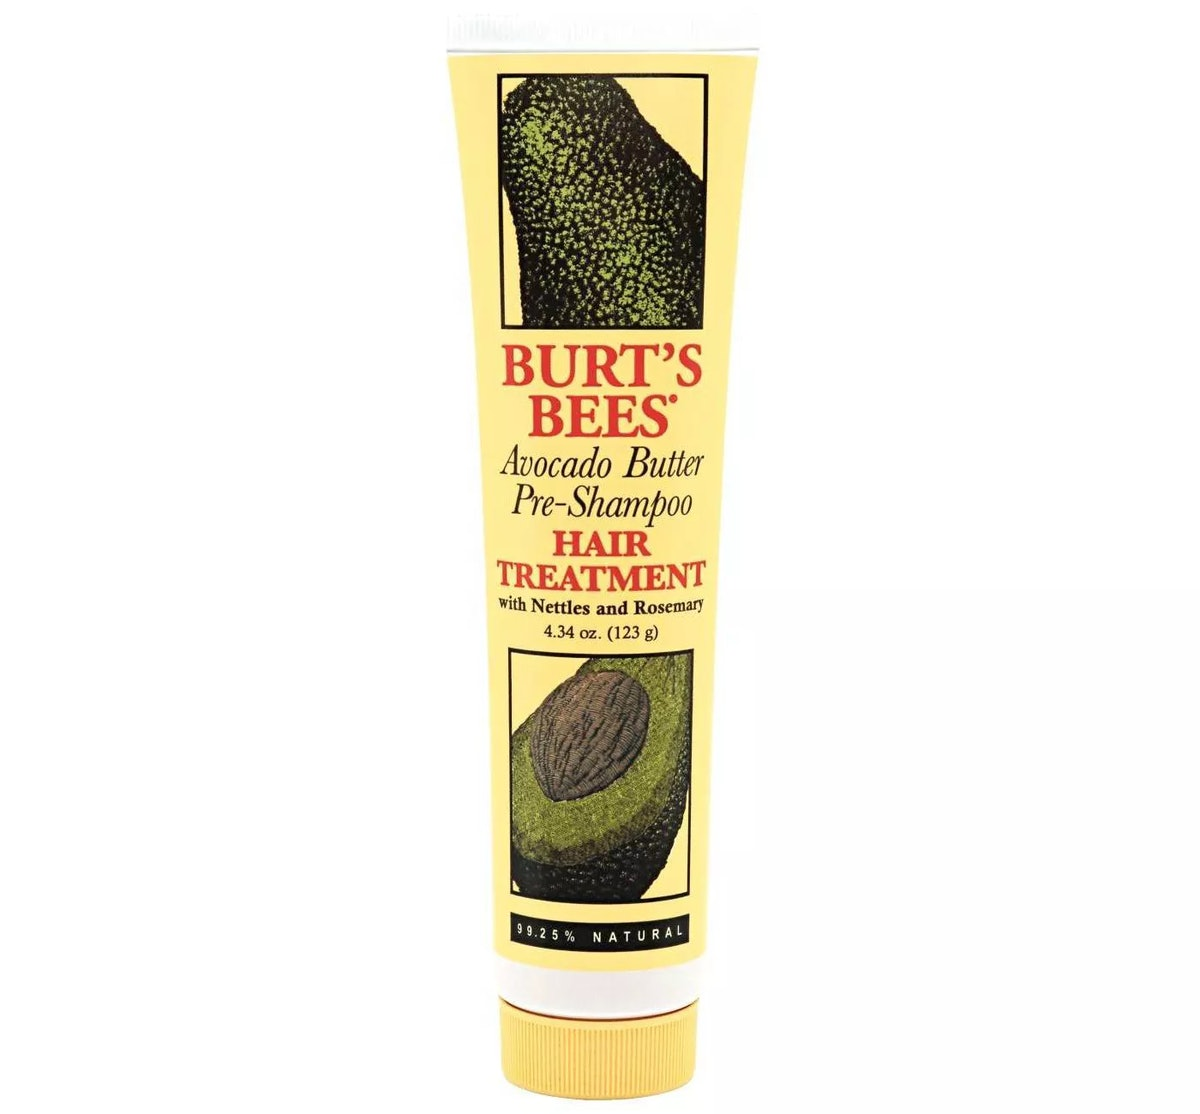 Avocado Butter Pre-Shampoo Hair Treatment